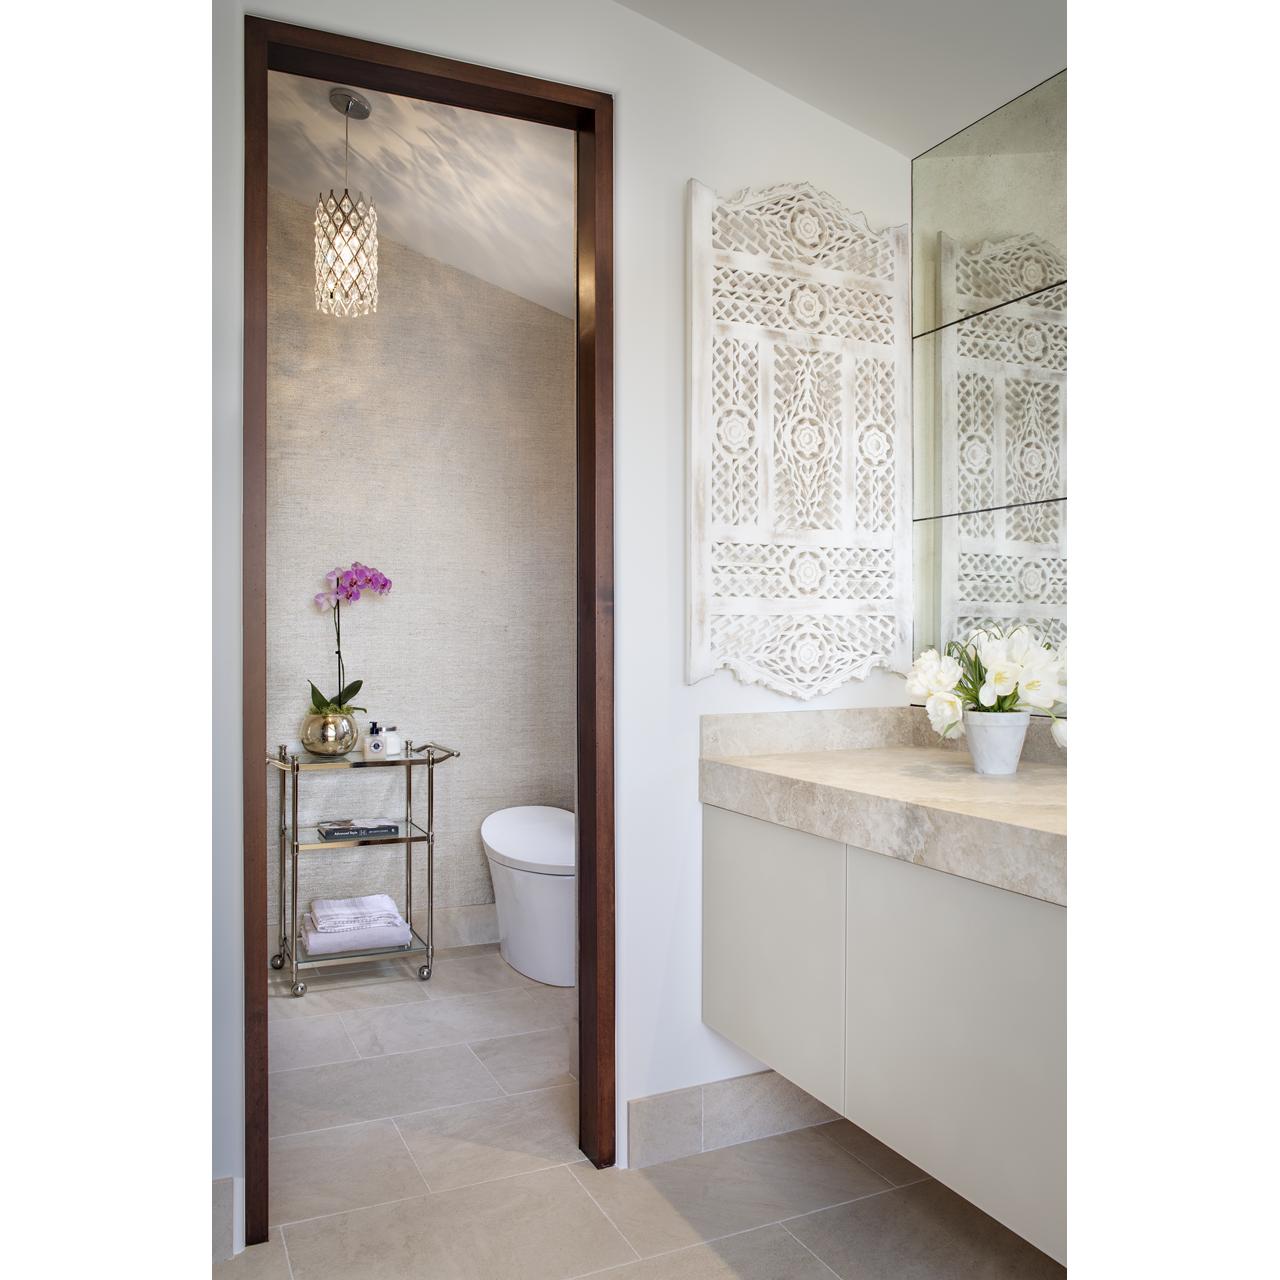 Bath Of The Year - San Diego Magazine - Grunow Construction - Image 05